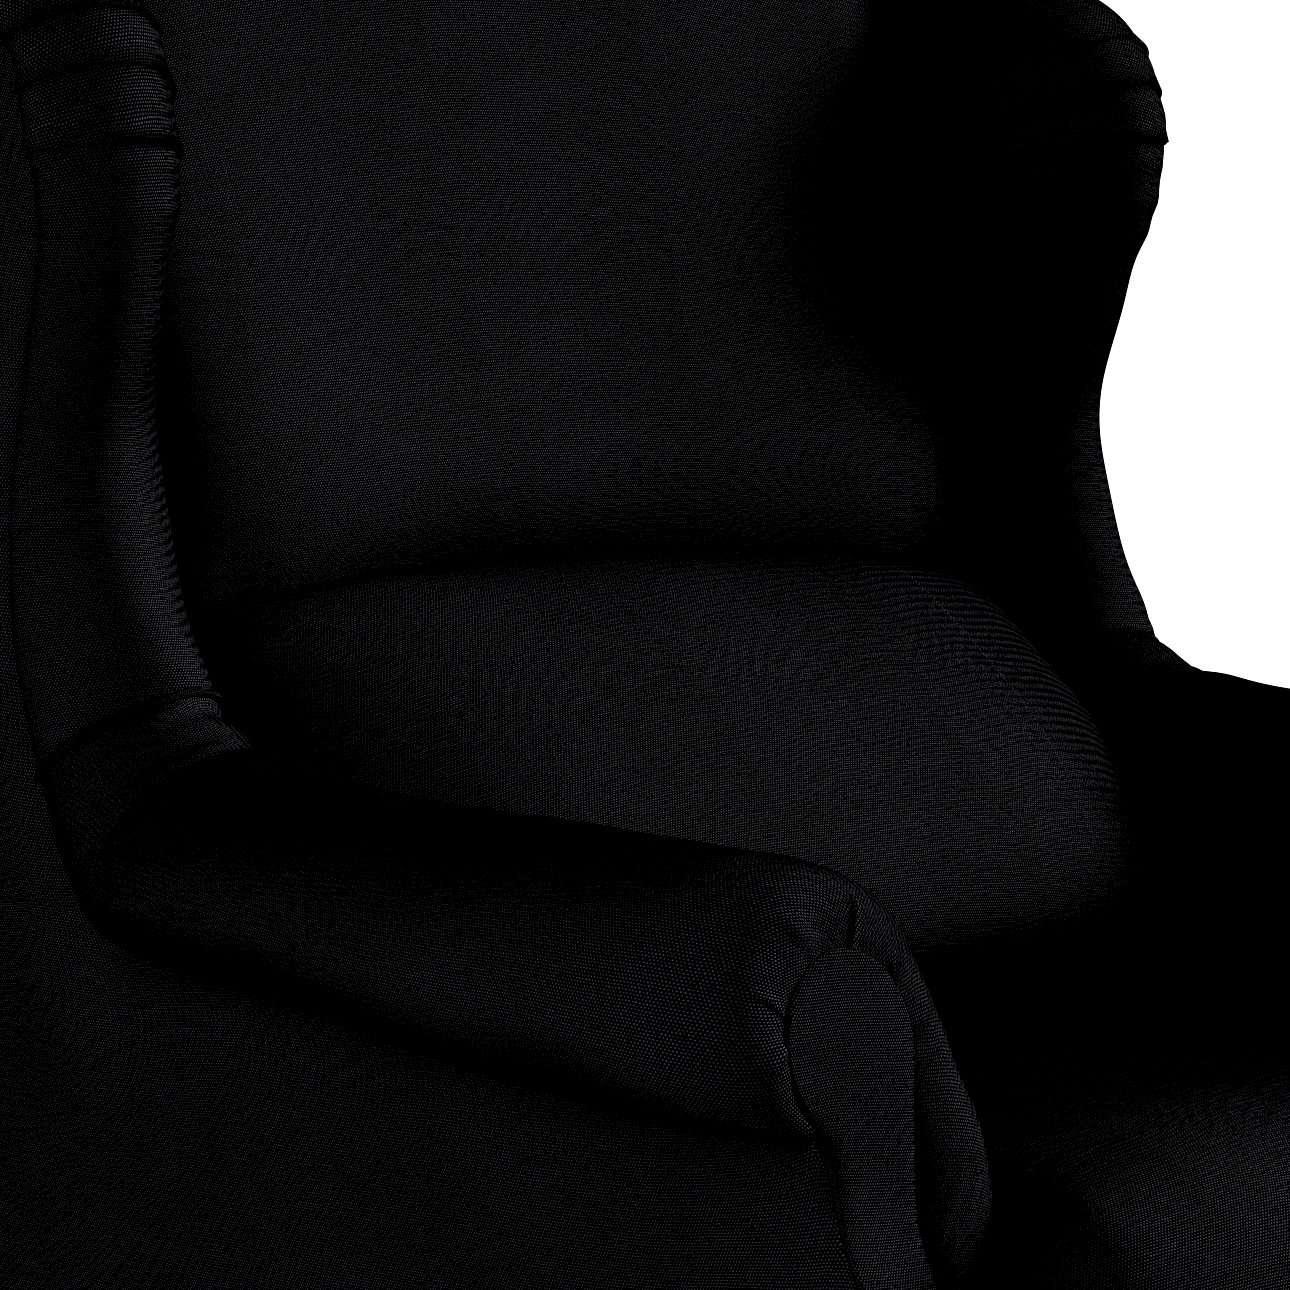 Stilingas Dekoria fotelis 63 x 115 cm kolekcijoje Etna , audinys: 705-00